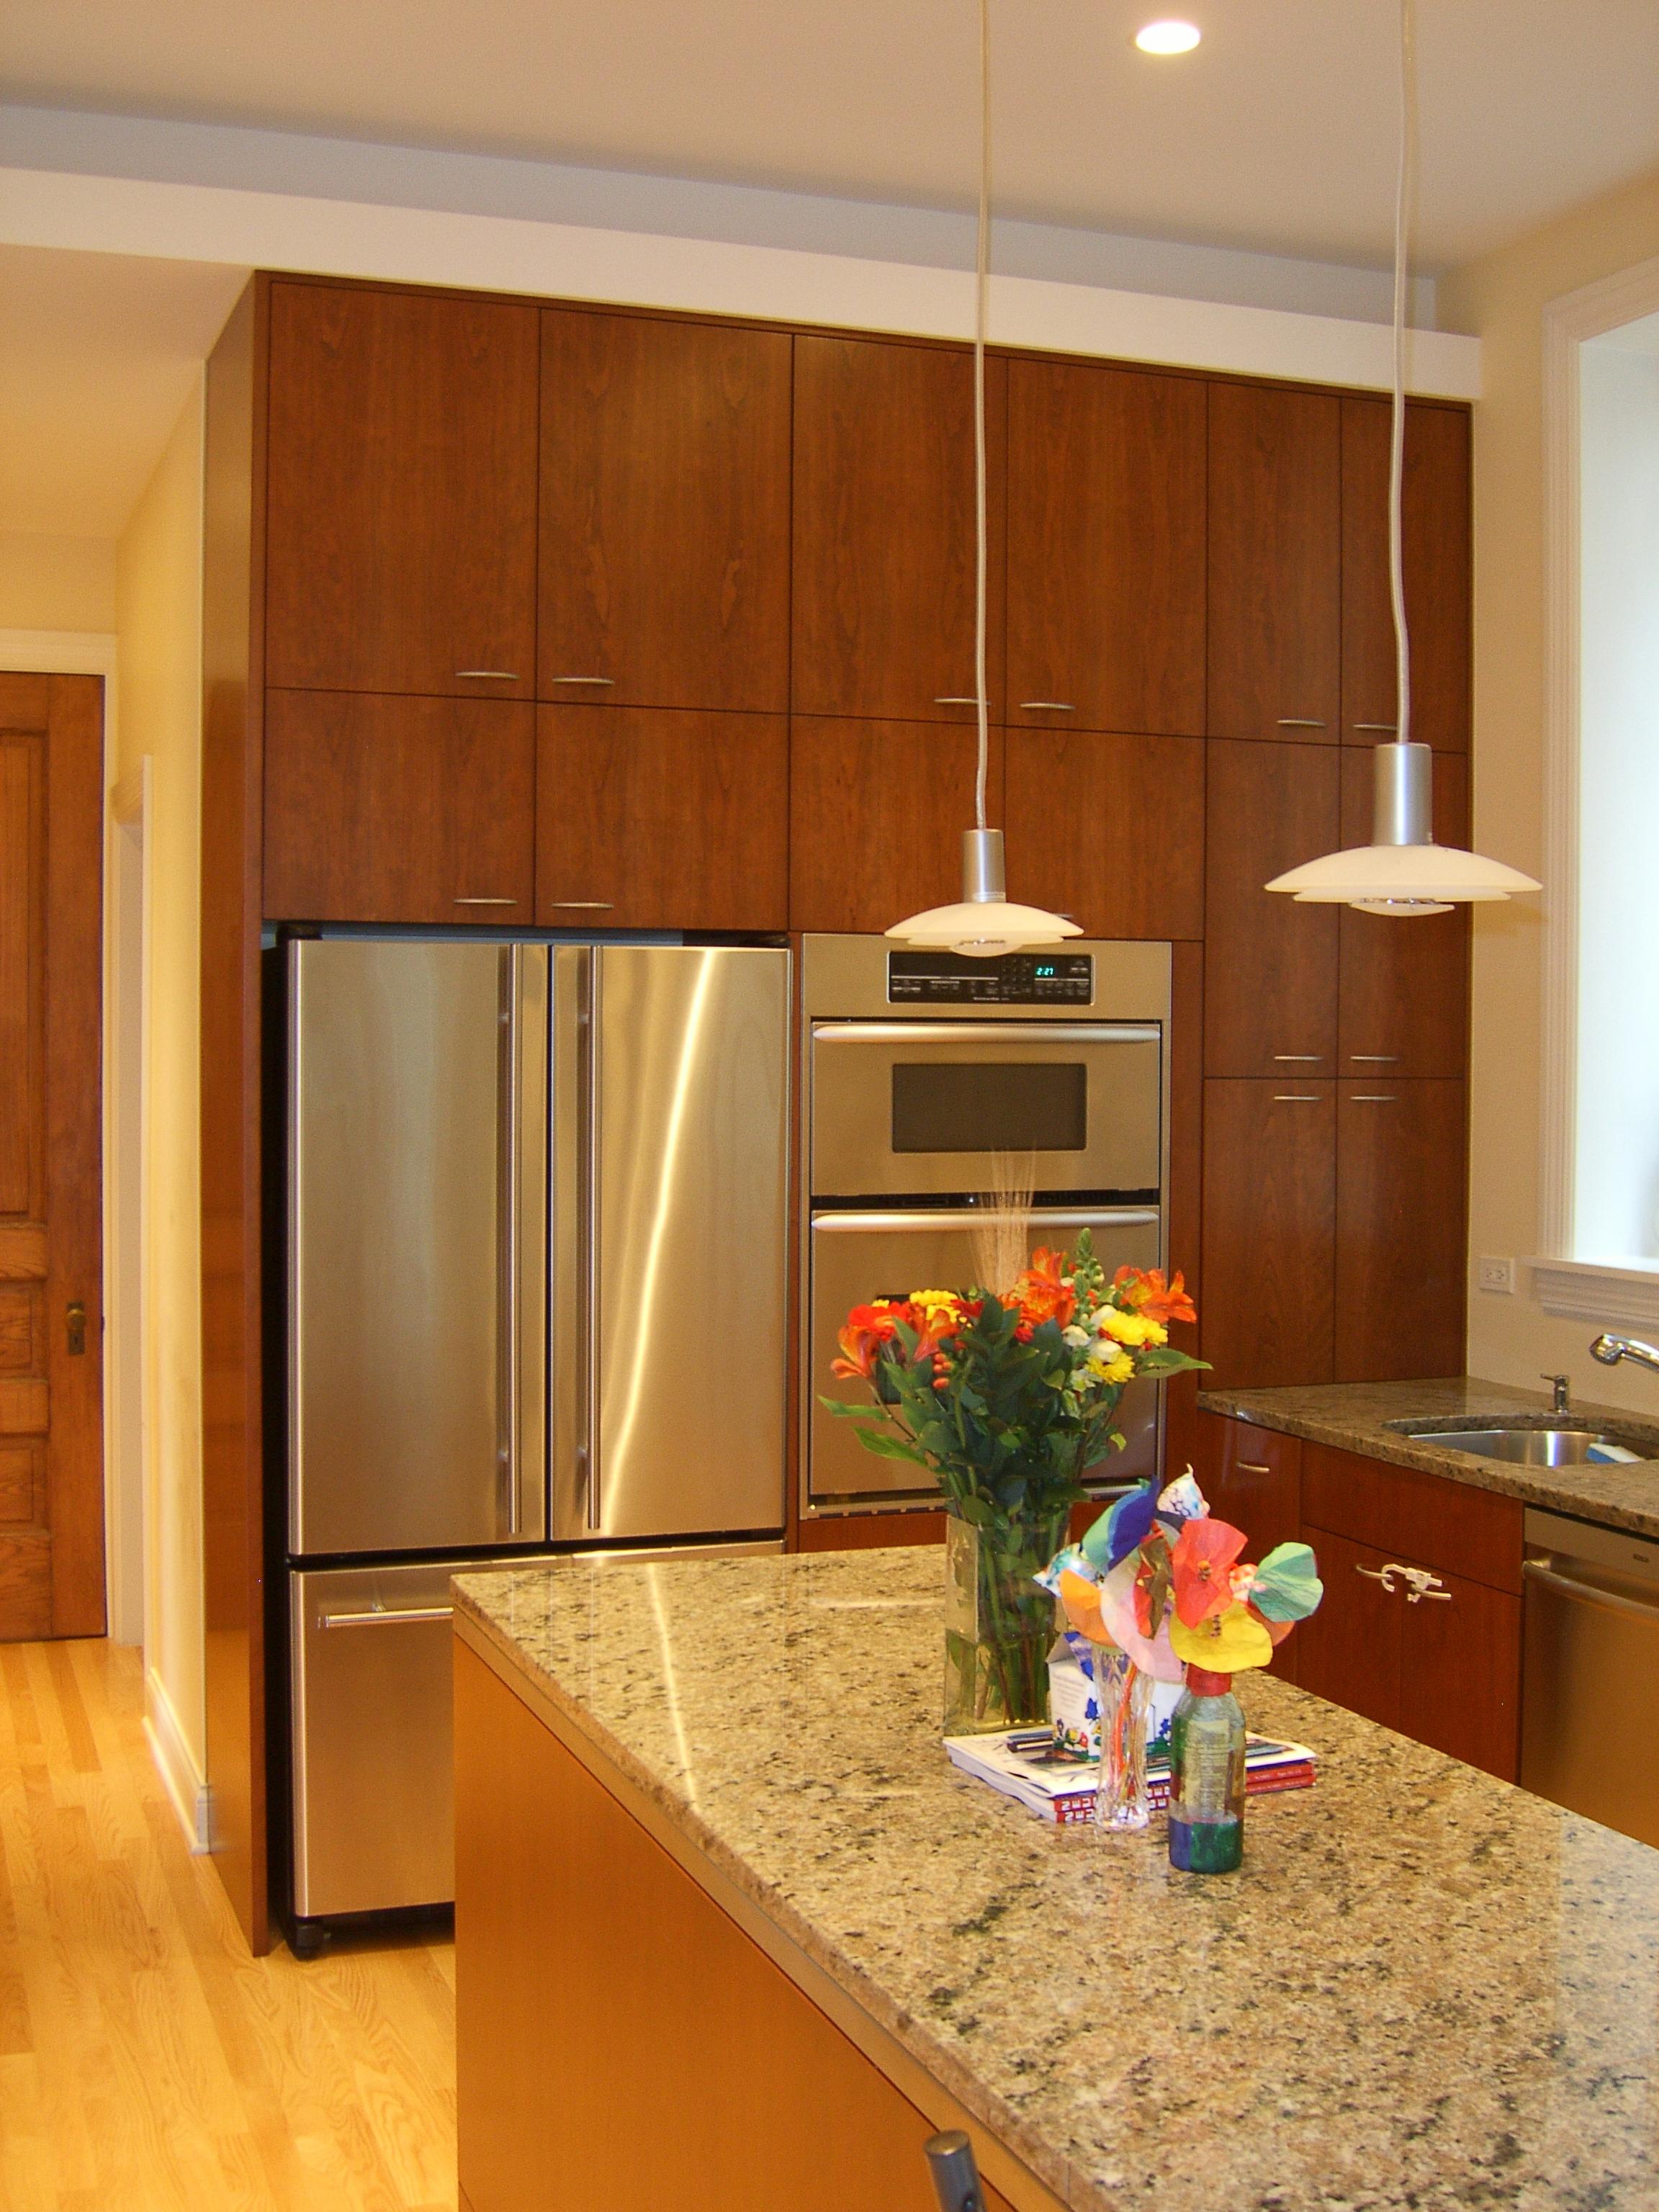 Fullerton_Parkway_Residence_Interior_Kitchen_Full_Height_Cabinetry.jpg